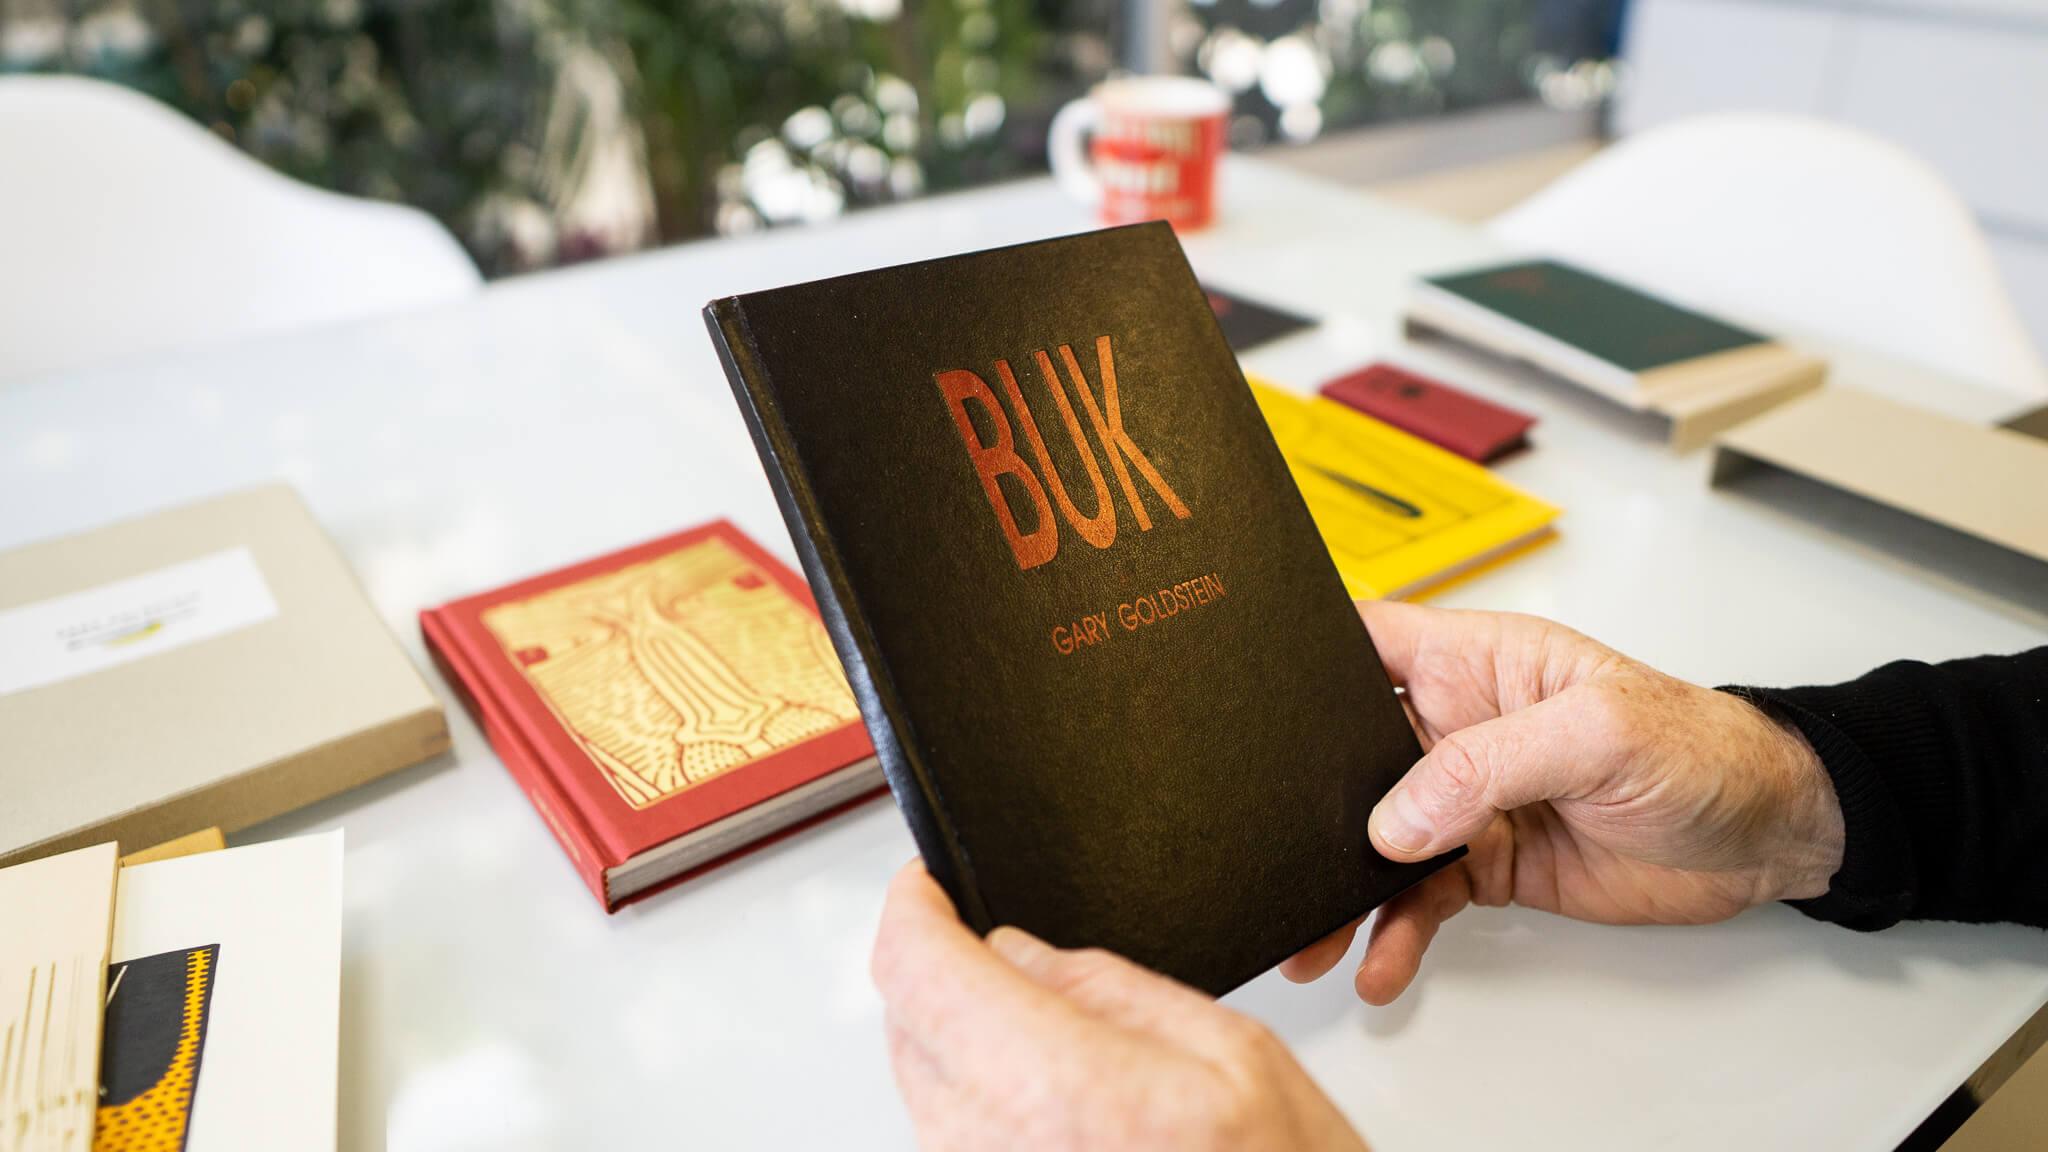 BUK - Gary Goldstein